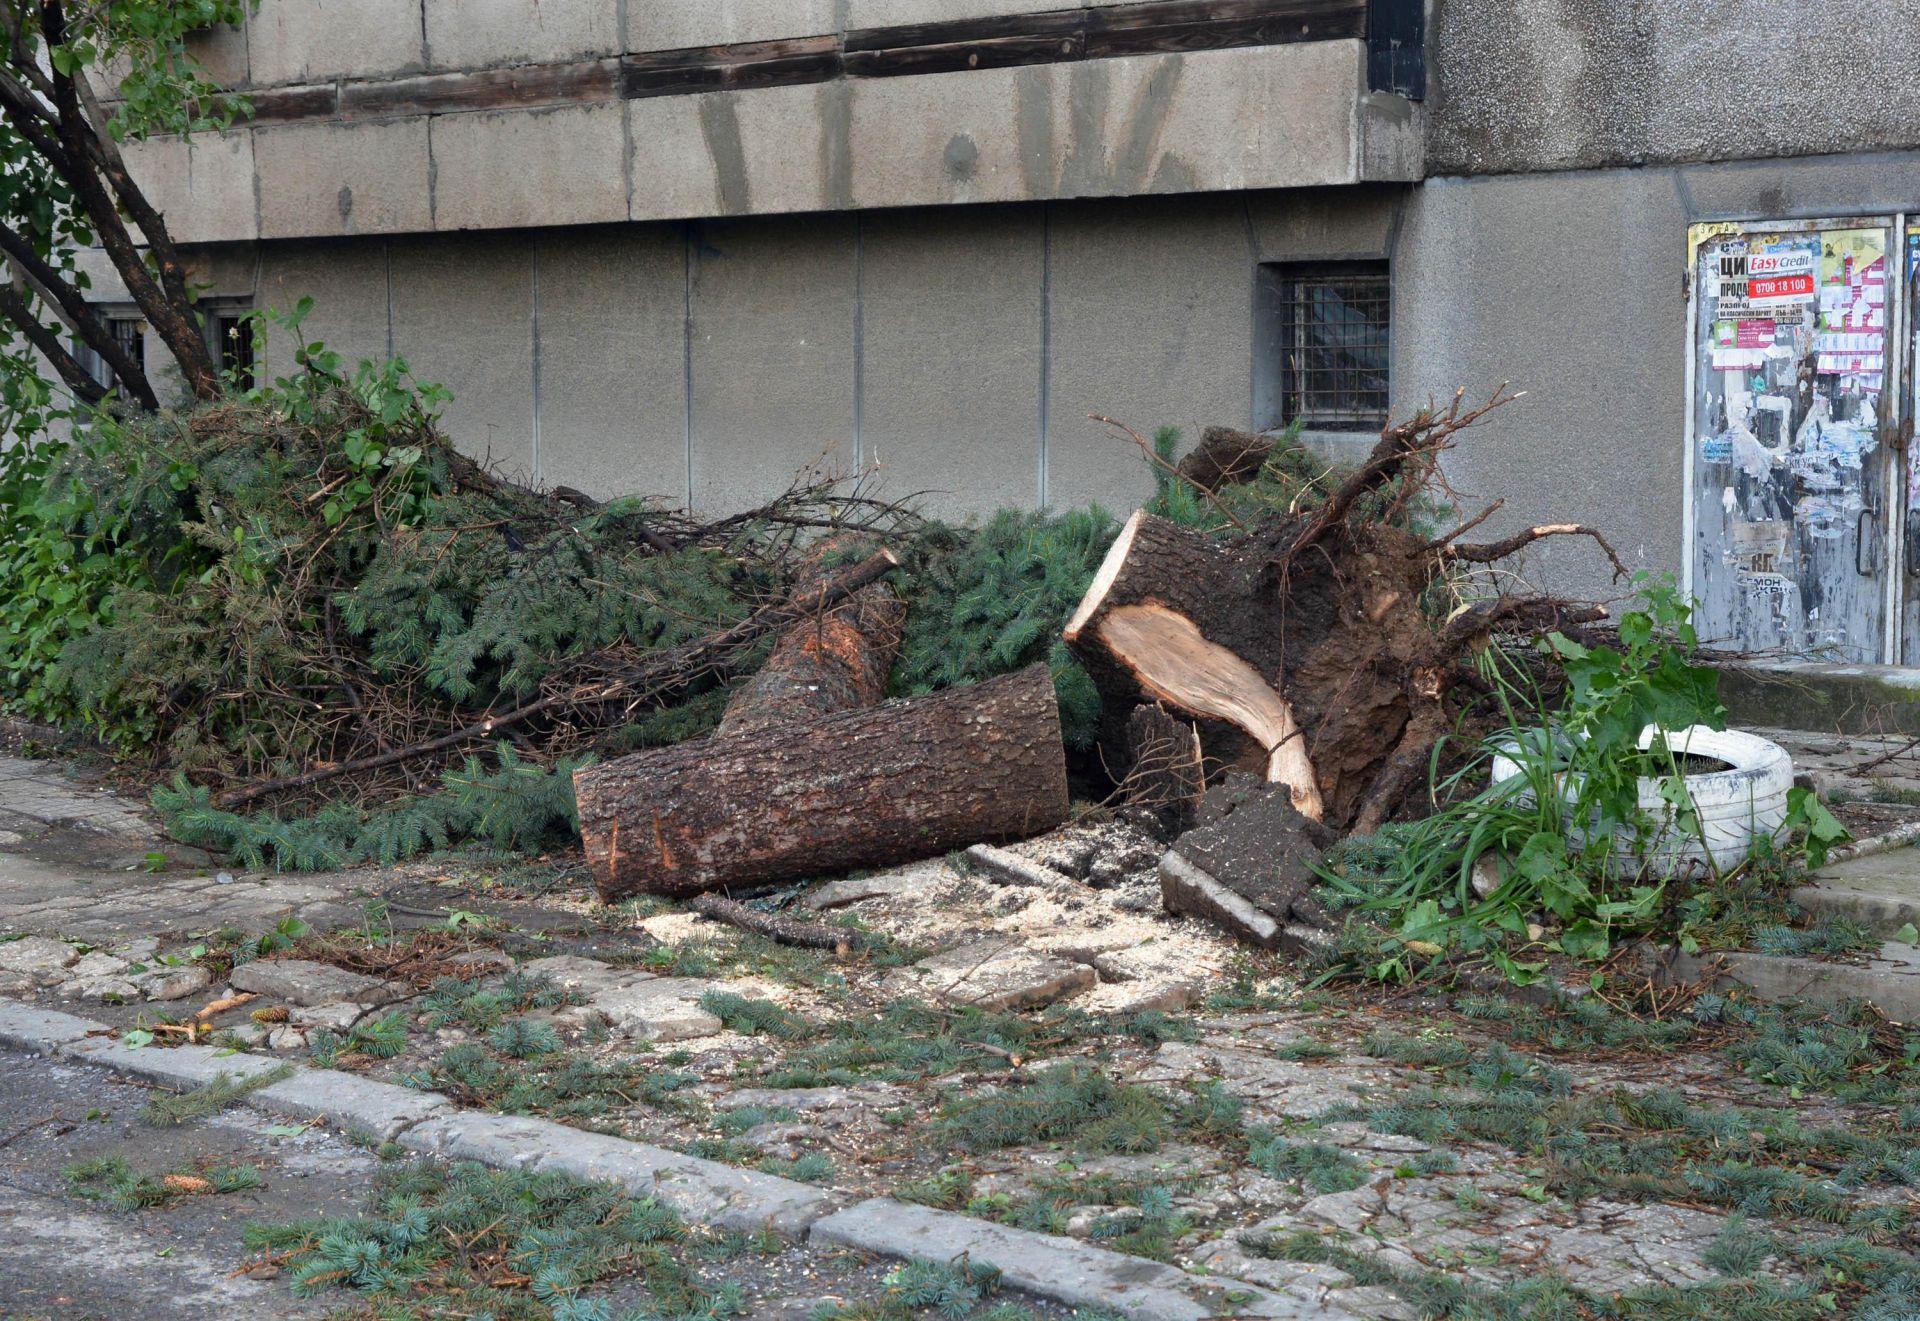 Паднало дърво затисна и уби пенсионер в Борисовата градина